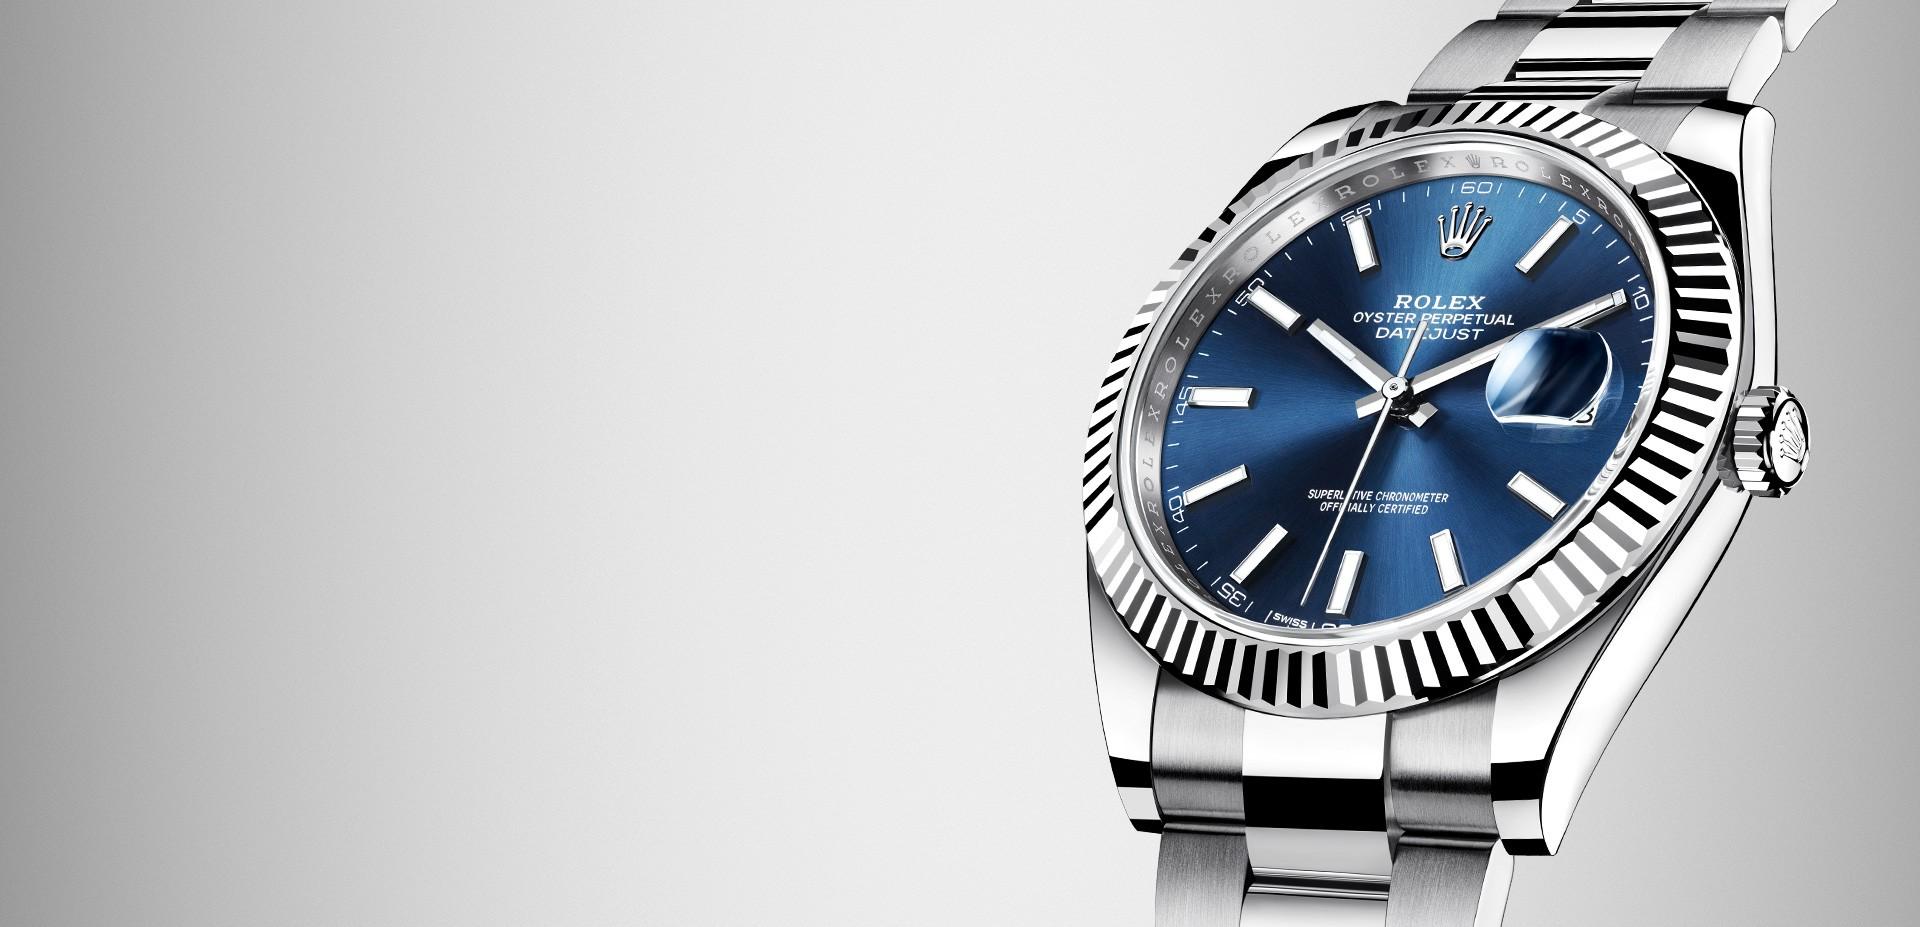 Rolex Datejust 126333 - Official Rolex Retailer